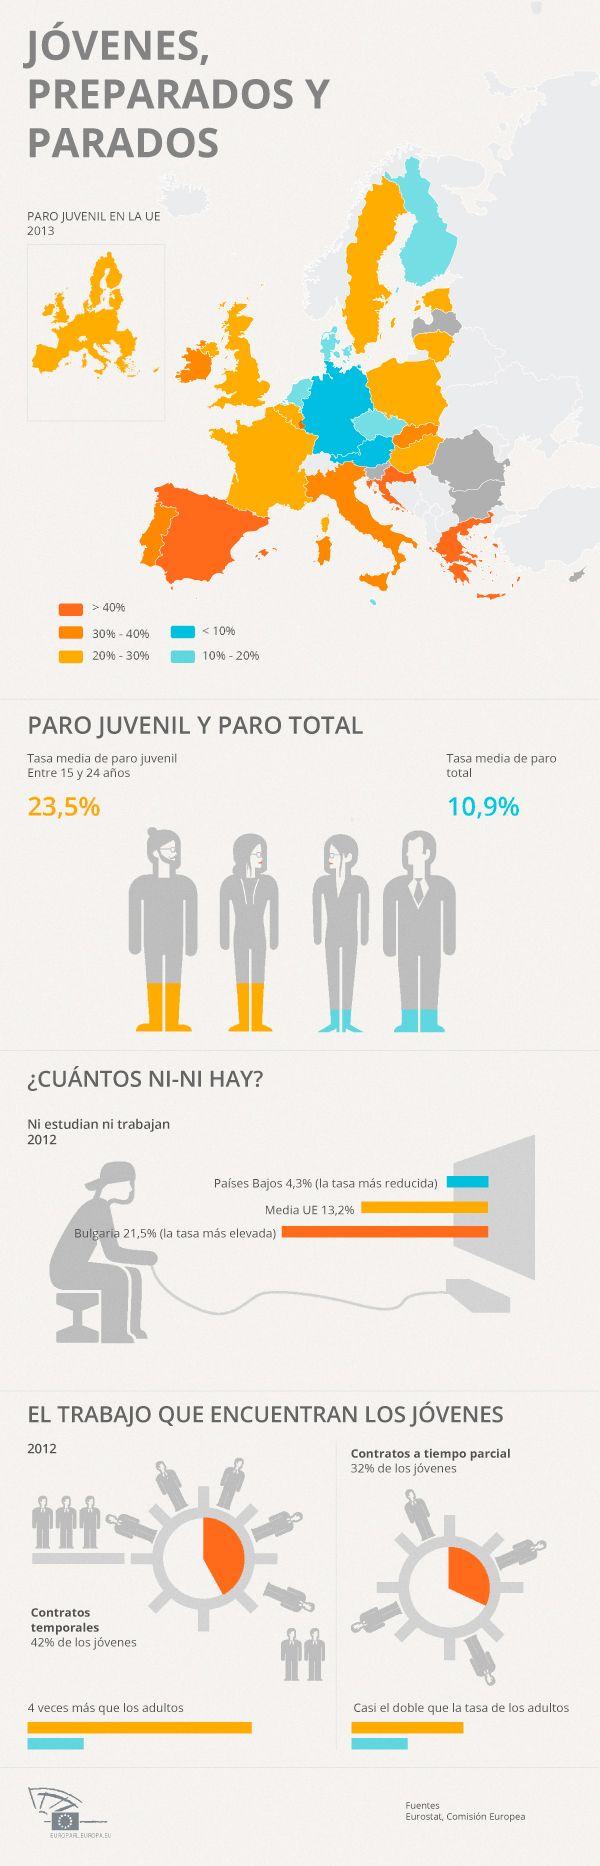 El terrible paro juvenil en la uni n europea infografia infographic